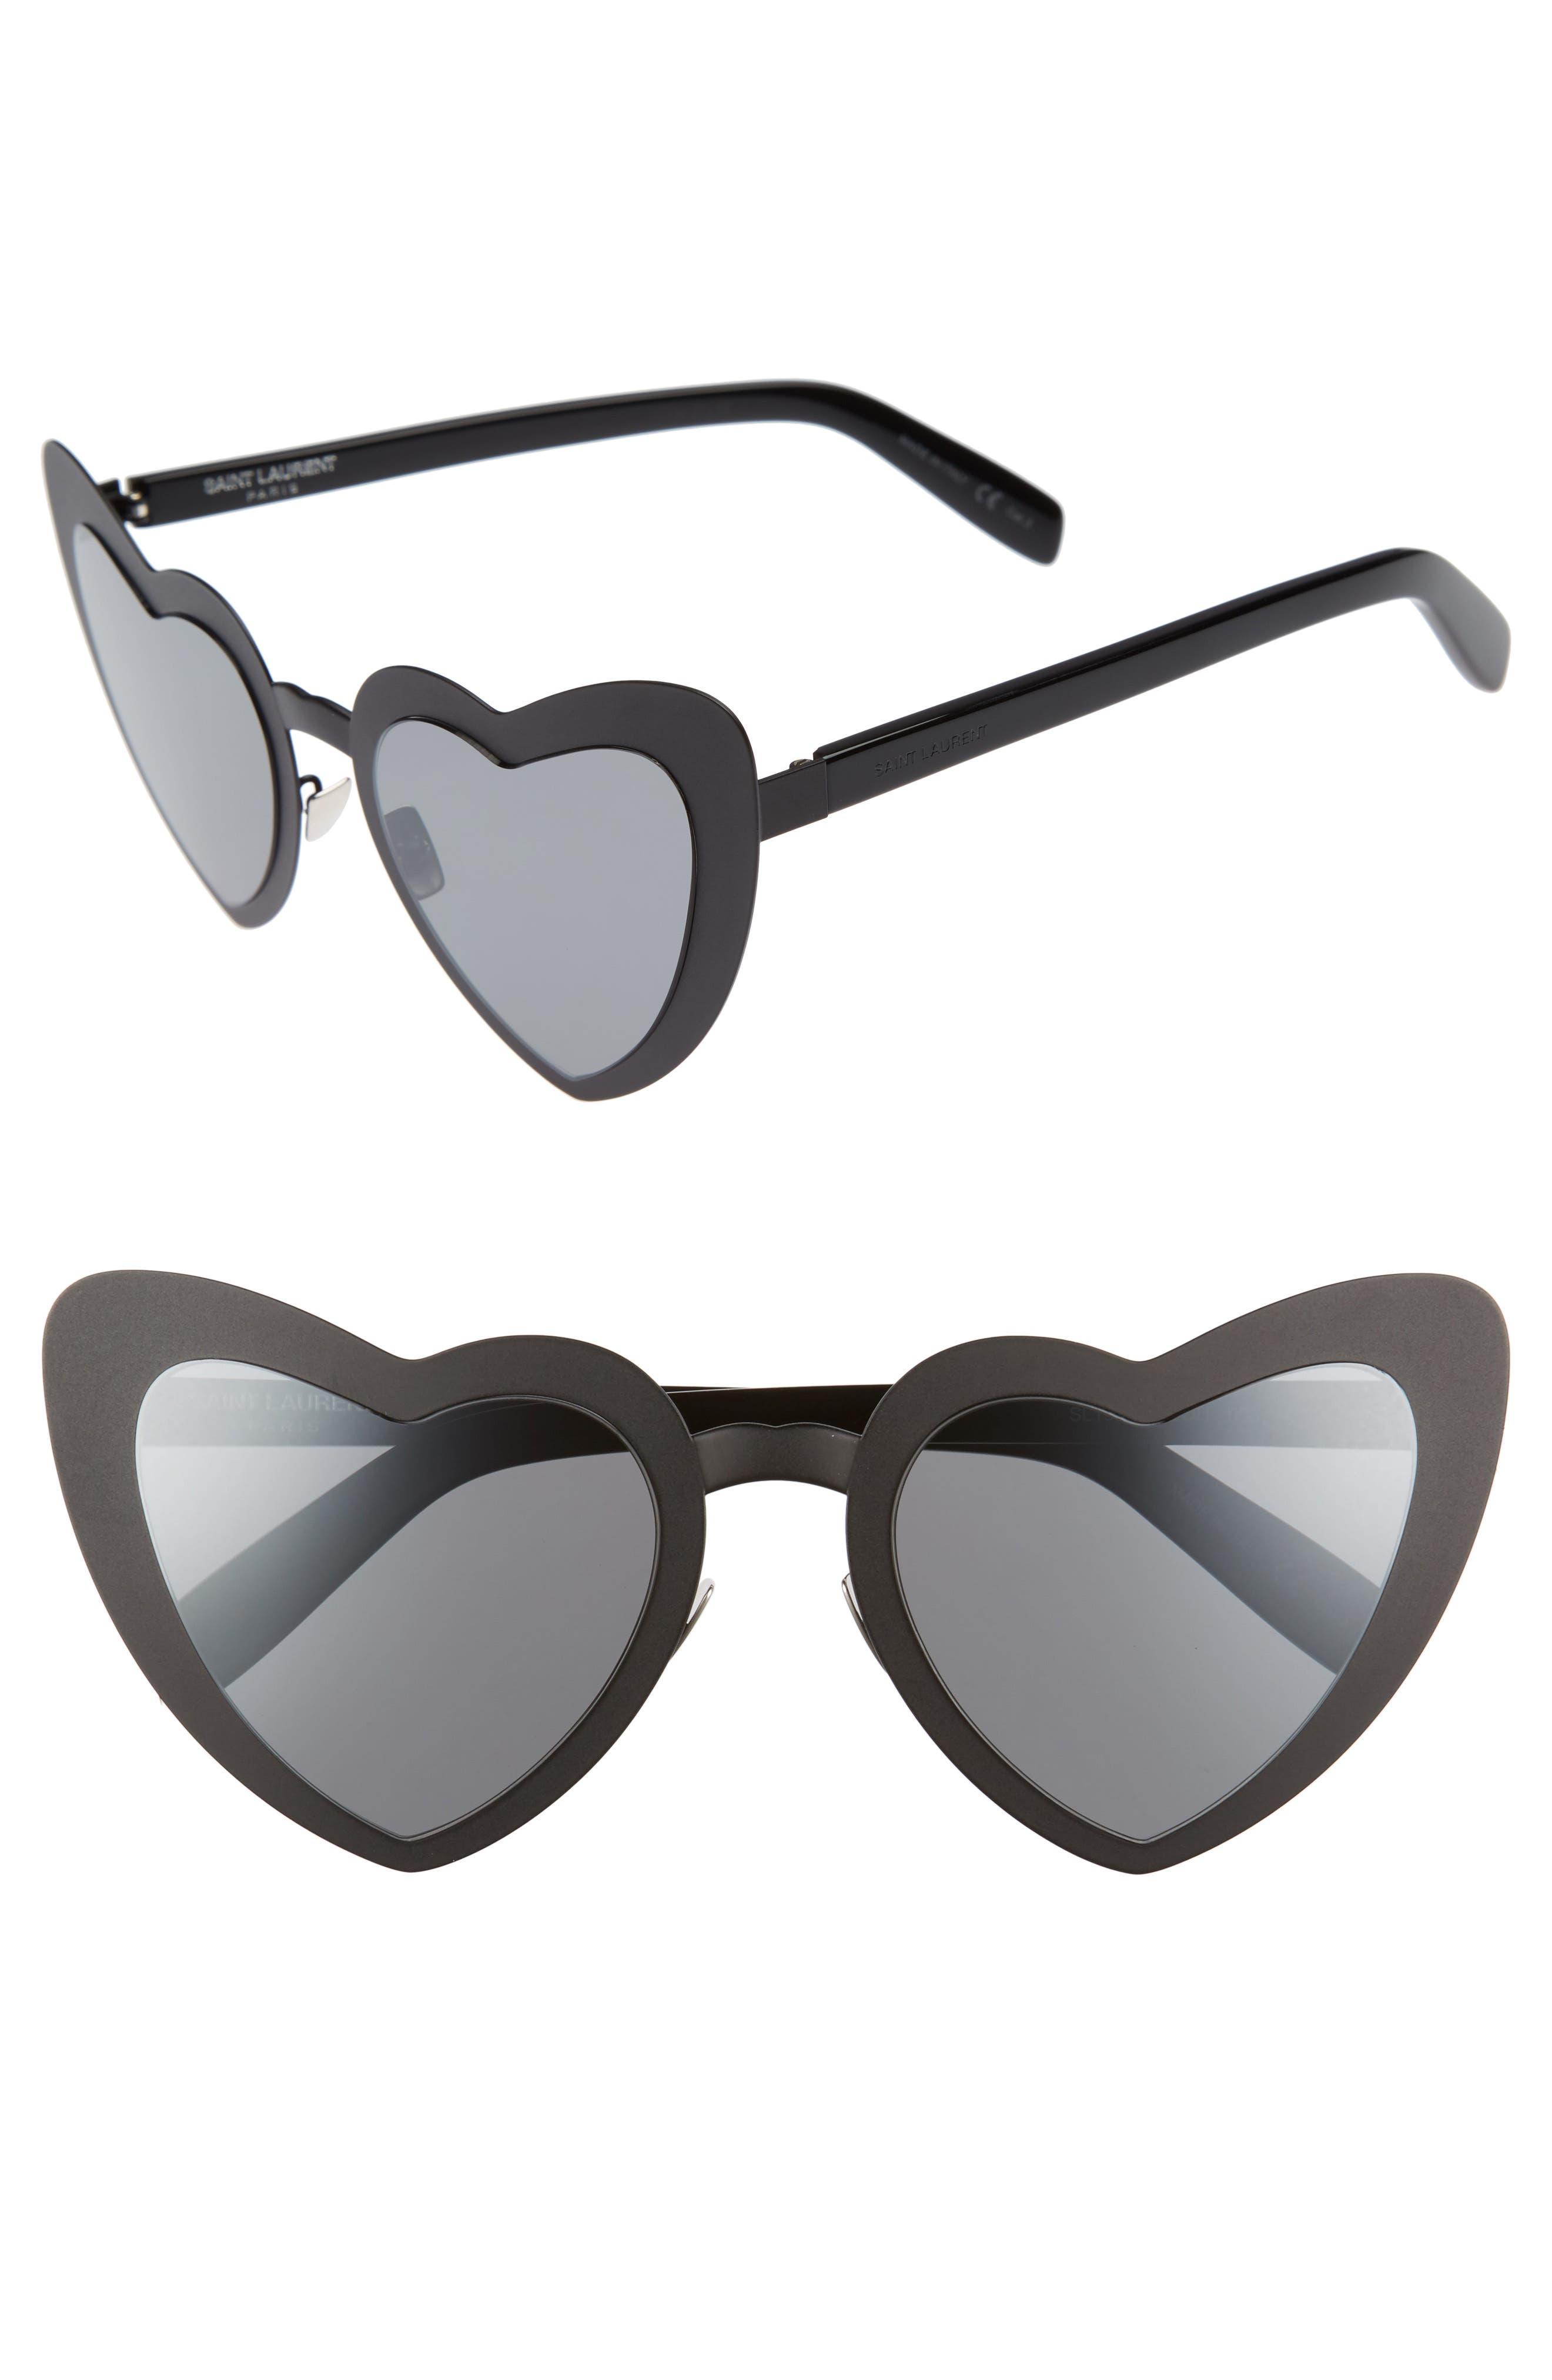 Loulou 55mm Heart Shaped Sunglasses,                             Main thumbnail 1, color,                             BLACK